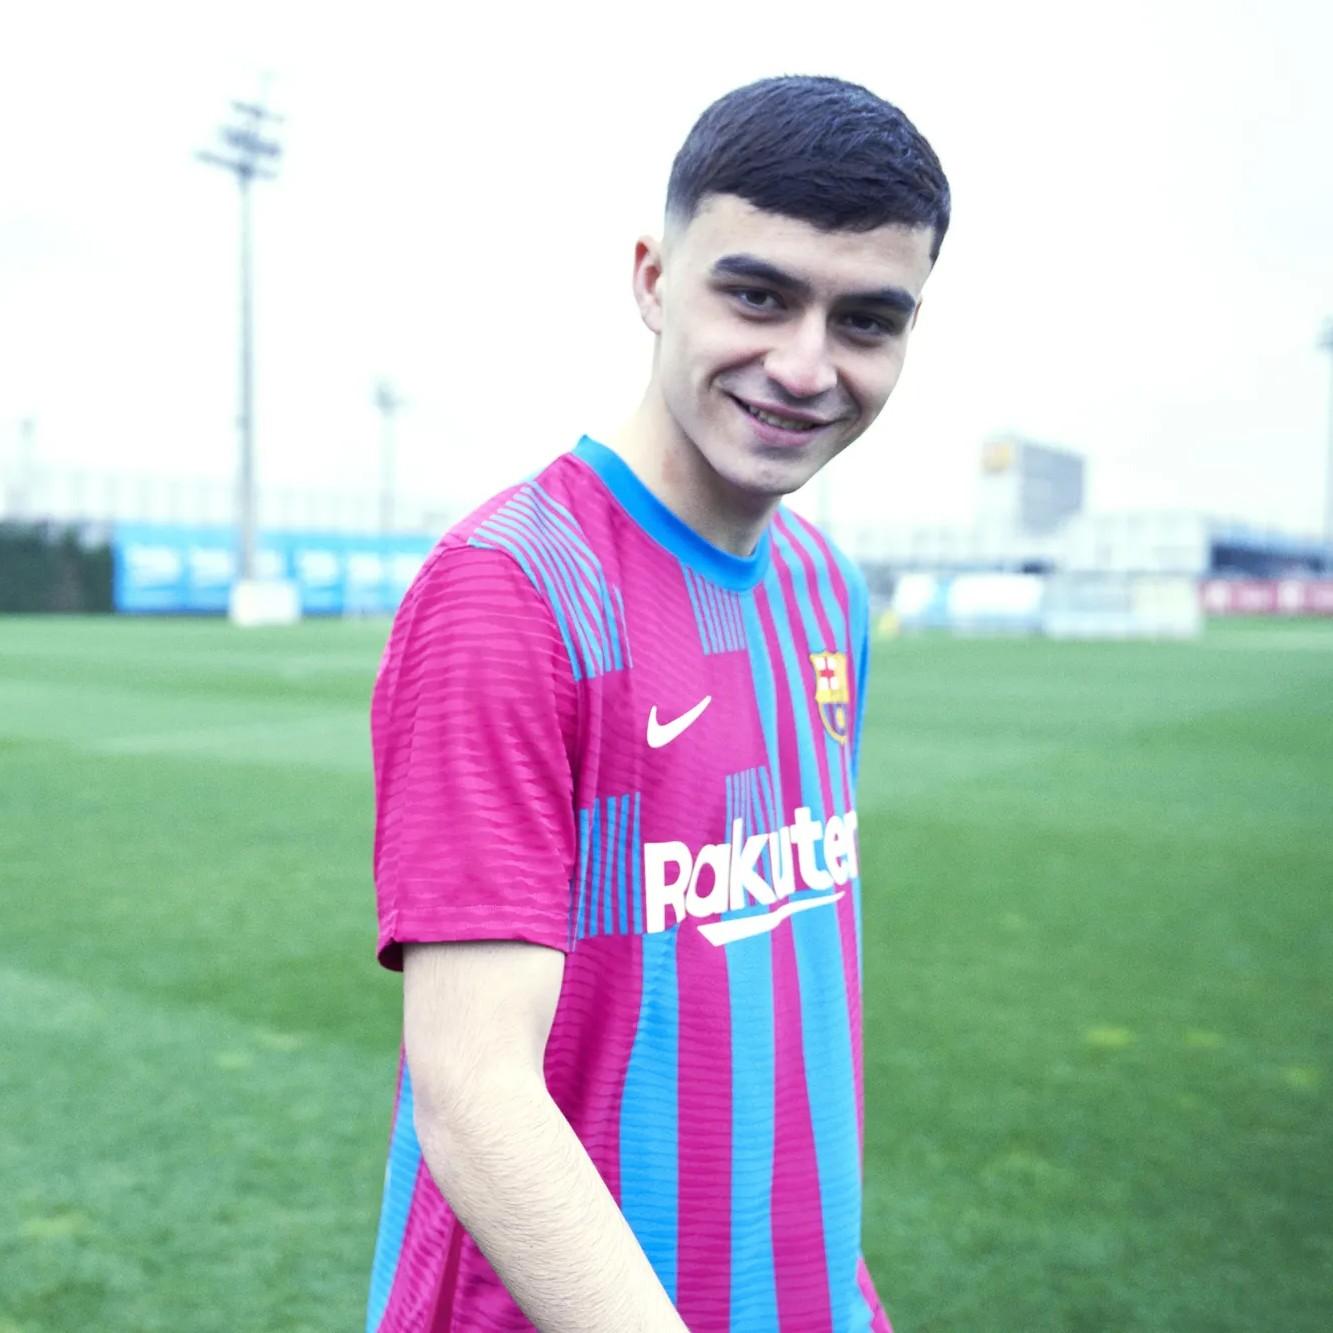 Fc Barcelona 2021 22 Home Kit